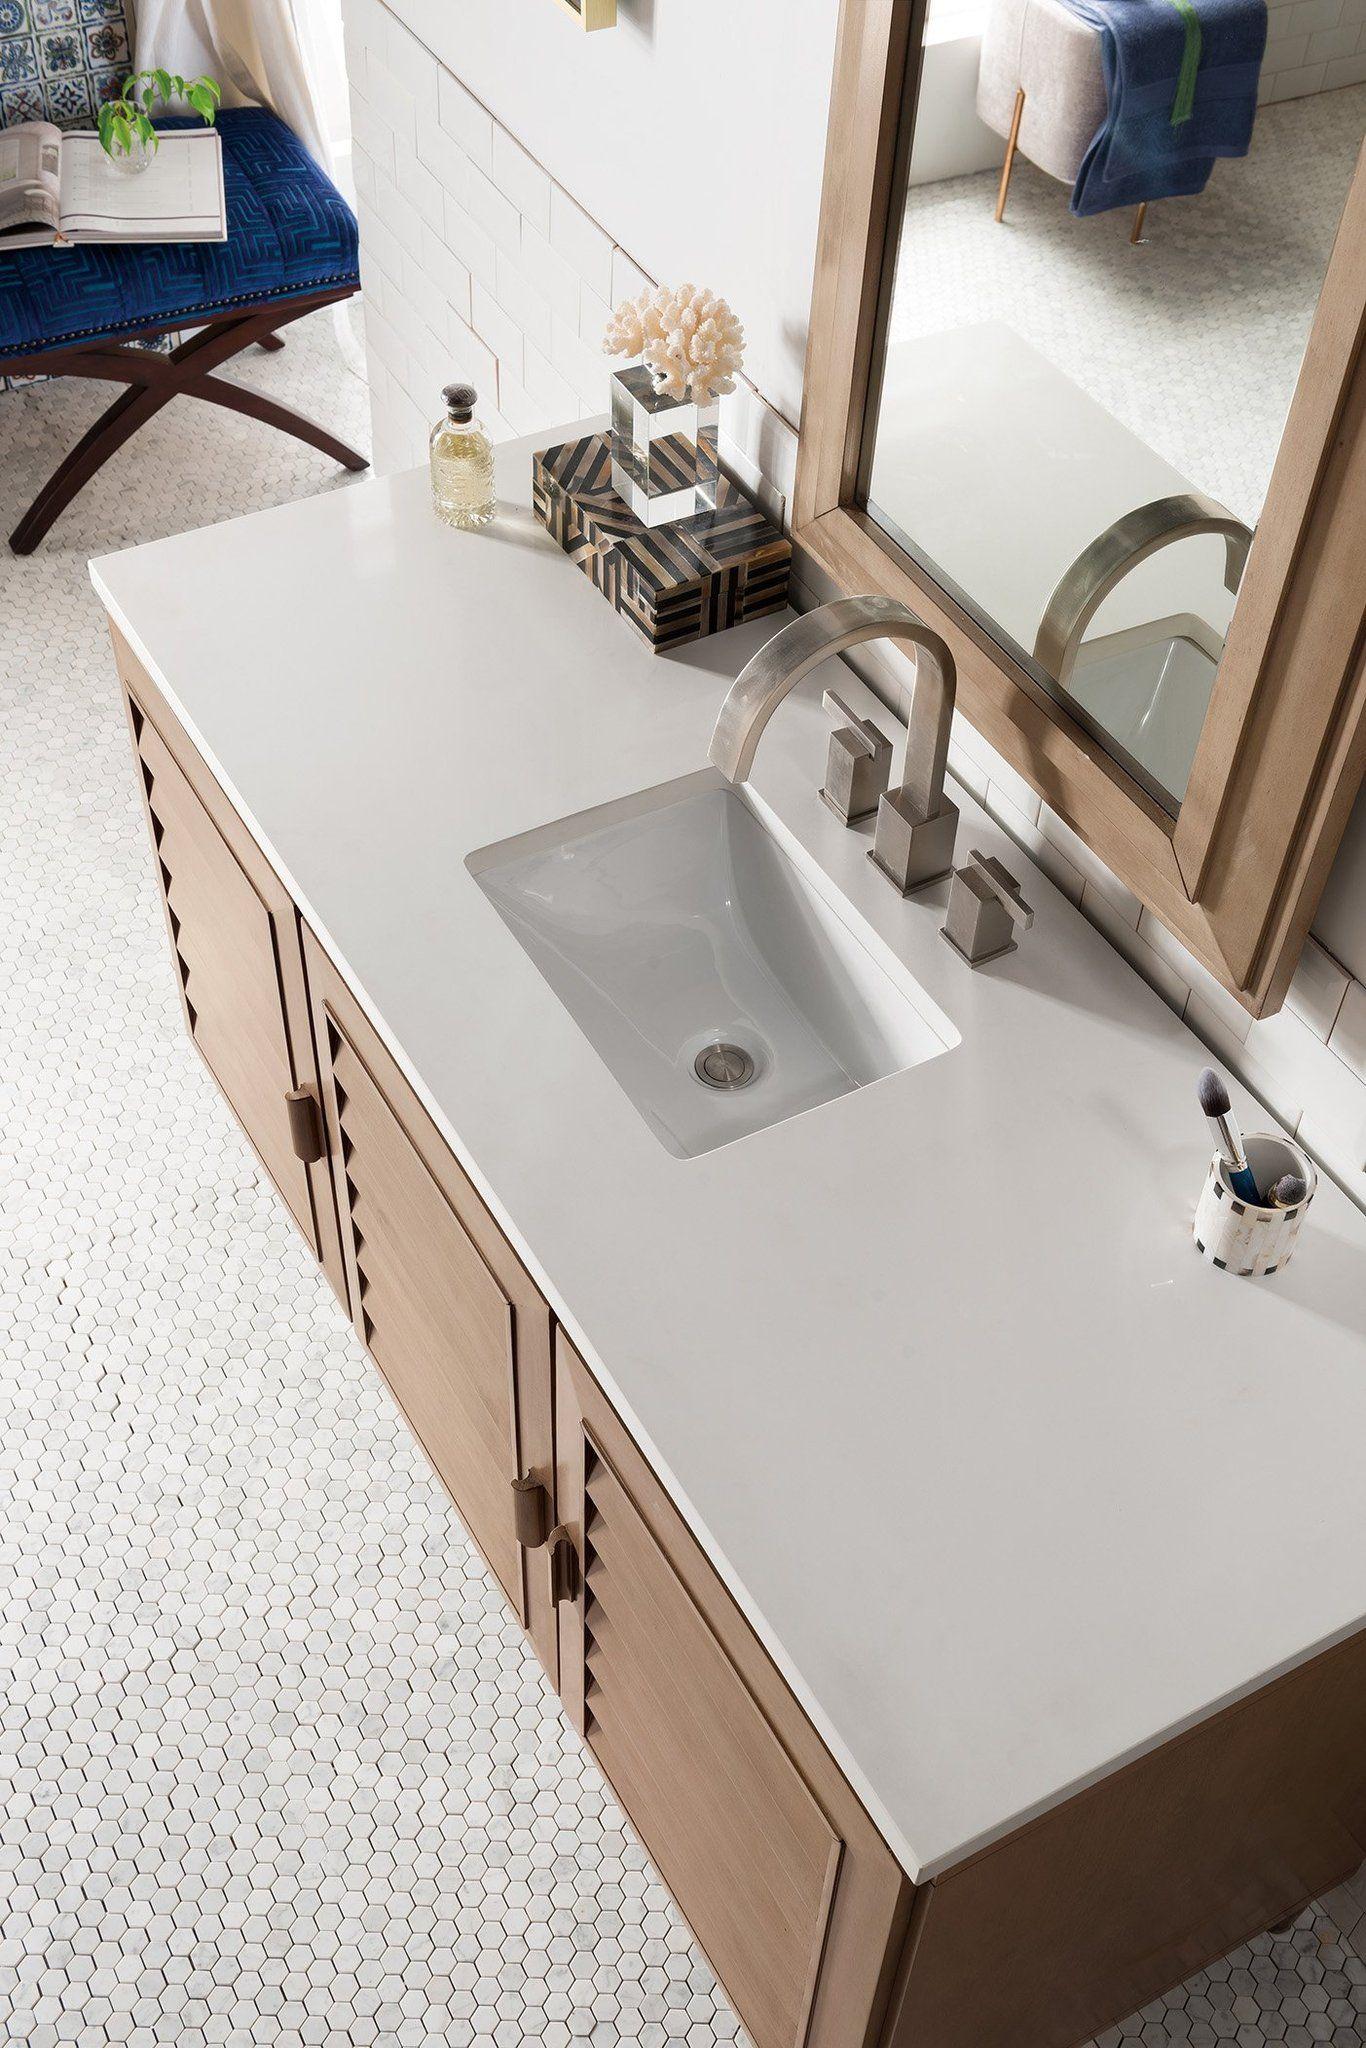 portland 60 single bathroom vanity in 2020 single on replacement countertops for bathroom vanity id=91558